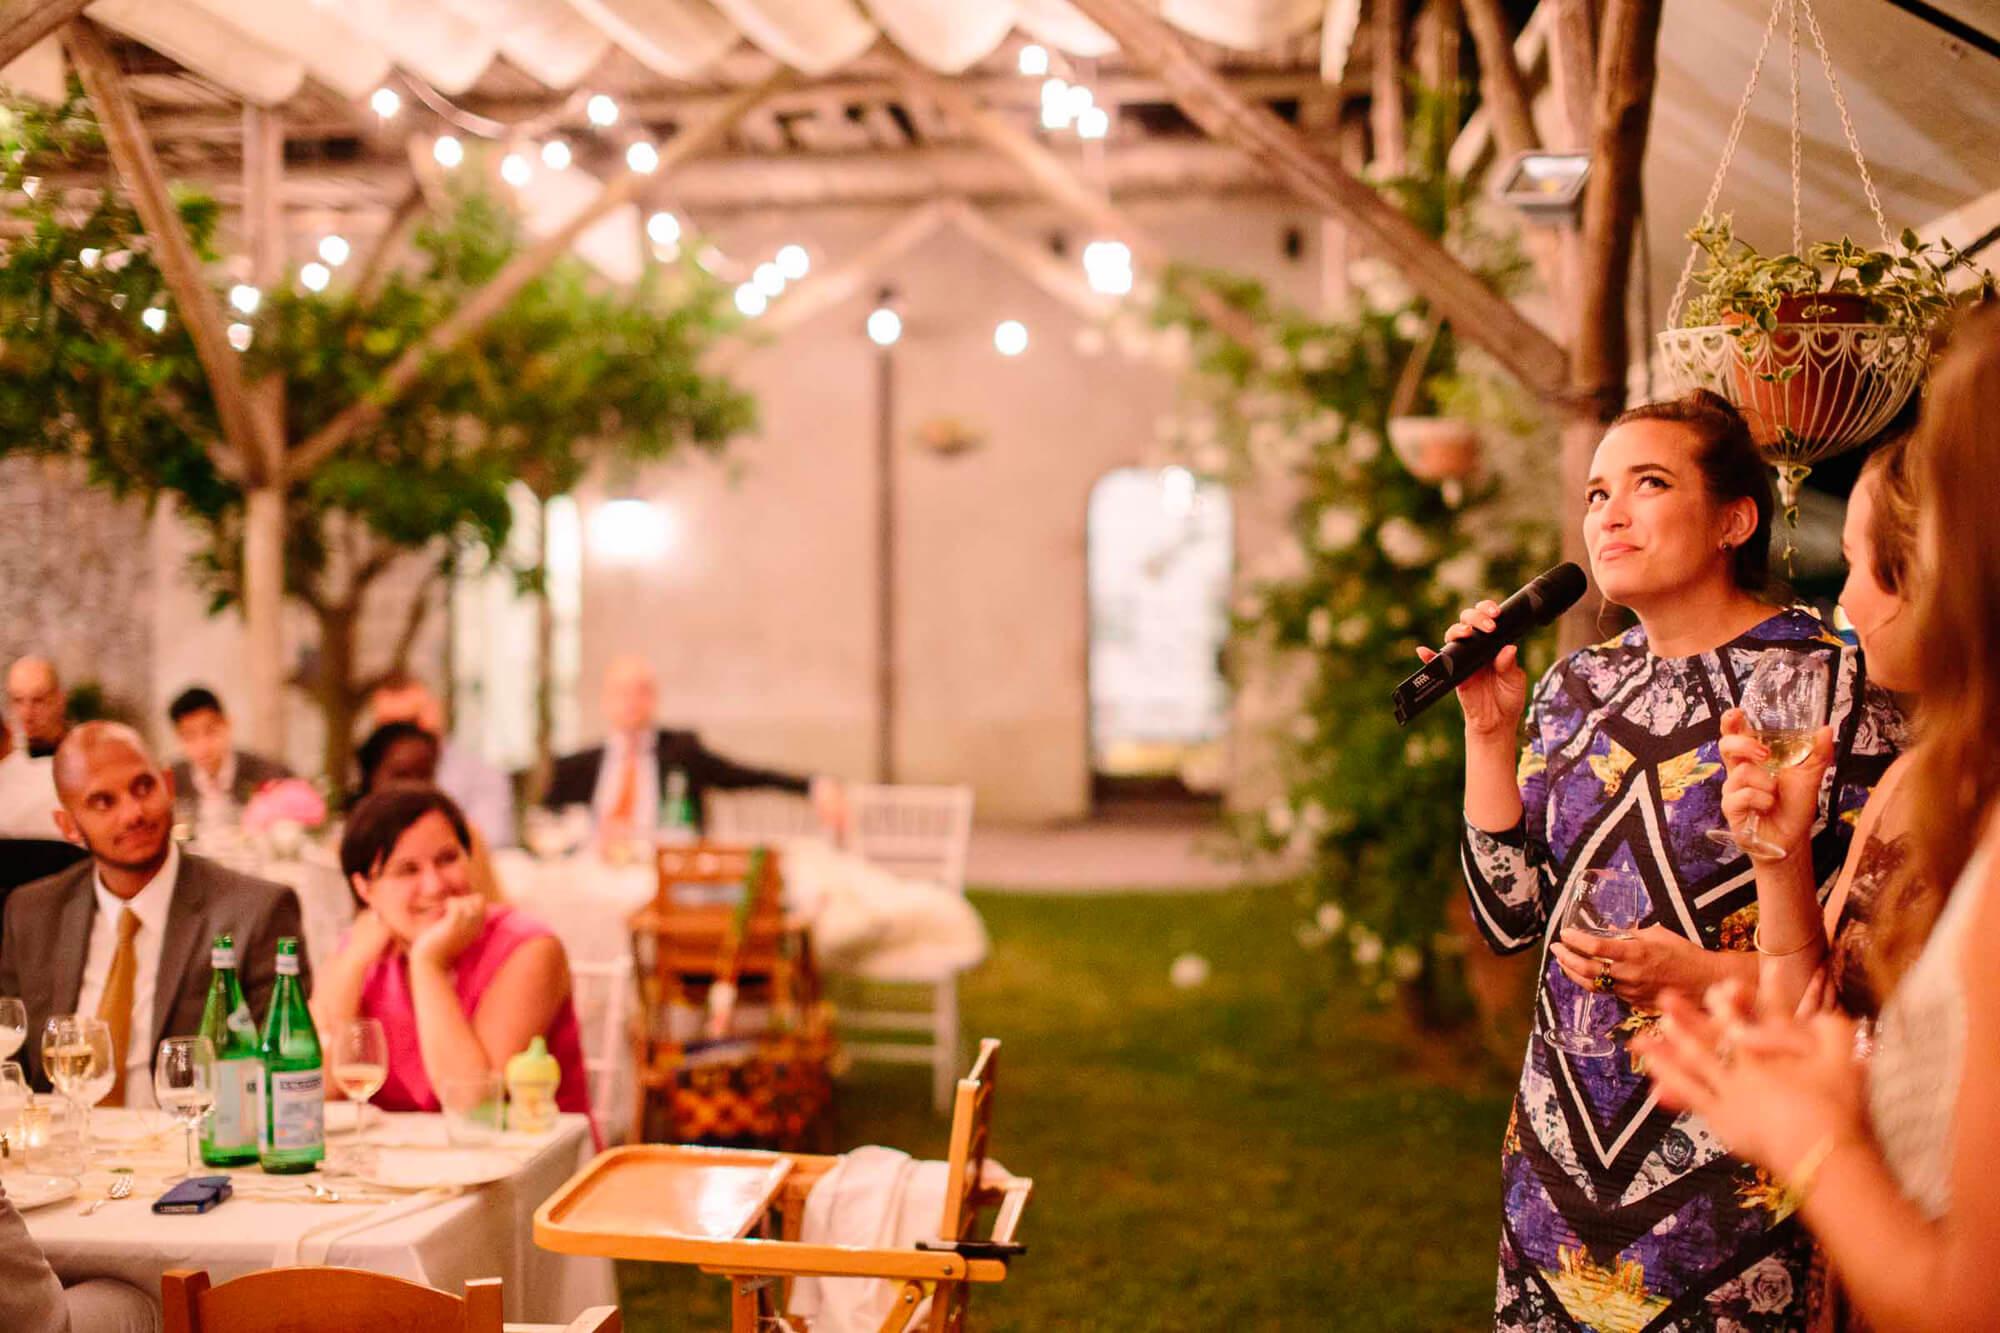 151-sorrento-wedding-photographer.jpg